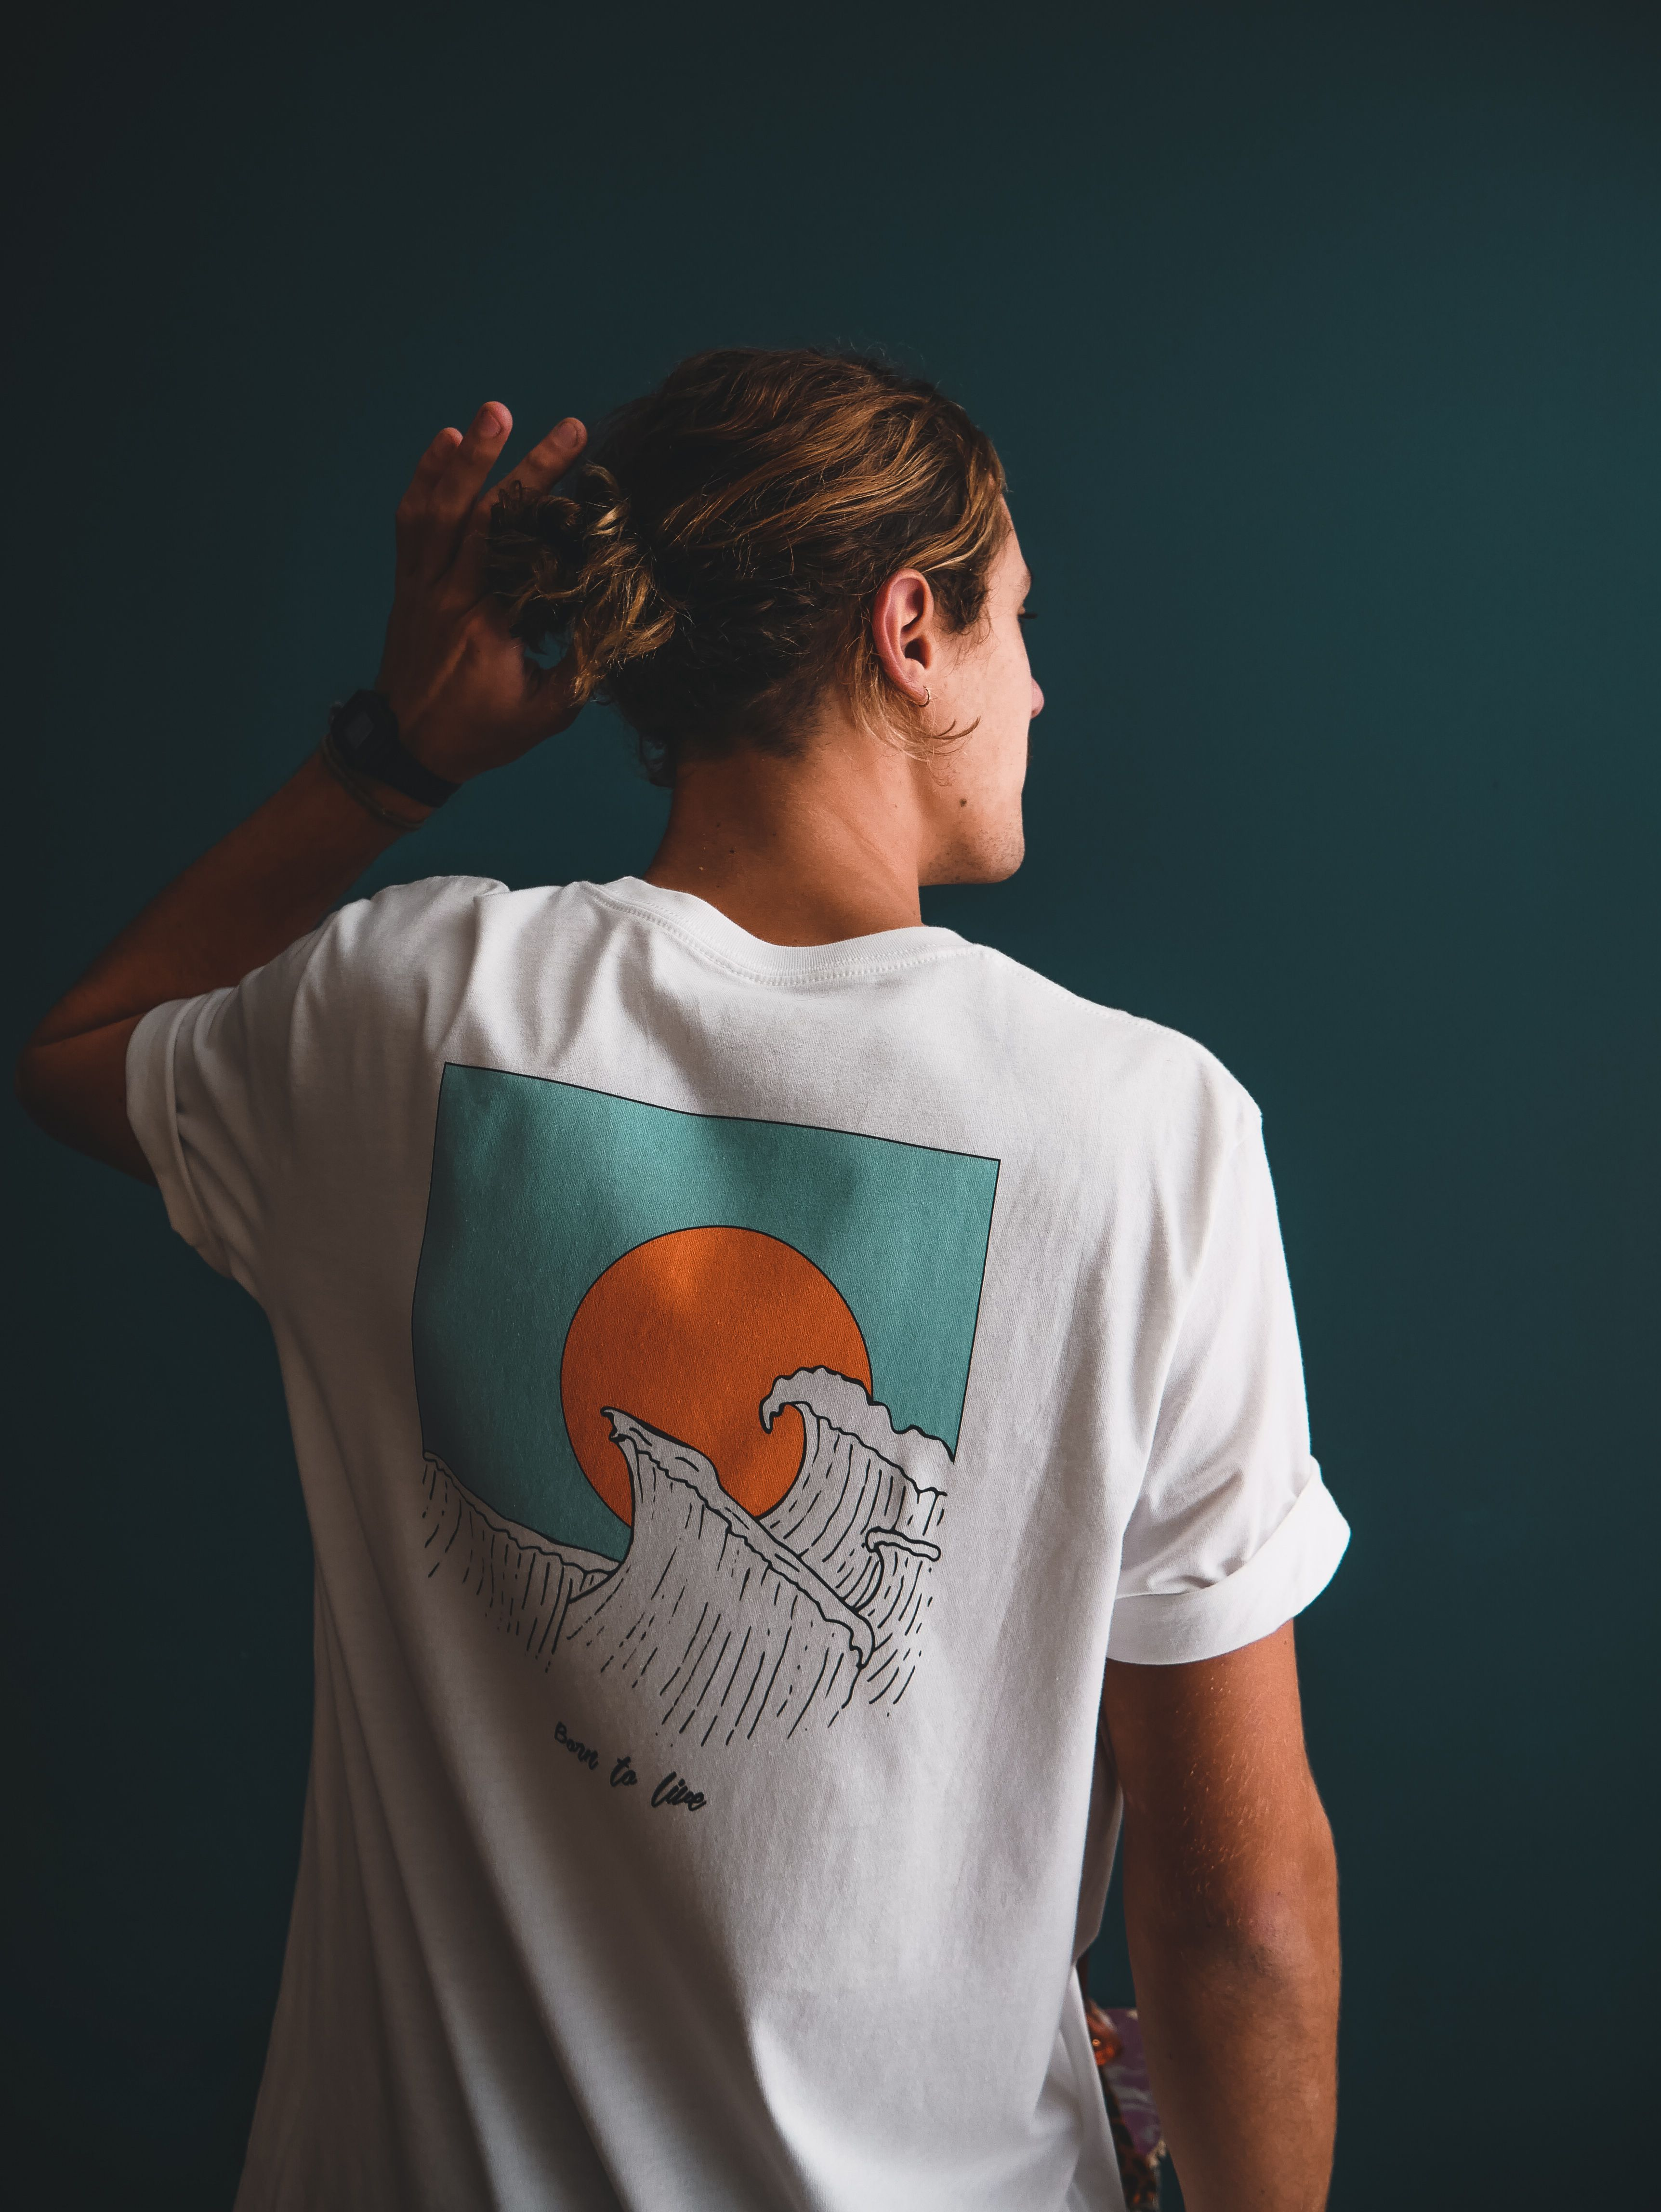 Born To Live T Shirt Shirt Design Inspiration Aesthetic T Shirts Shirt Print Design